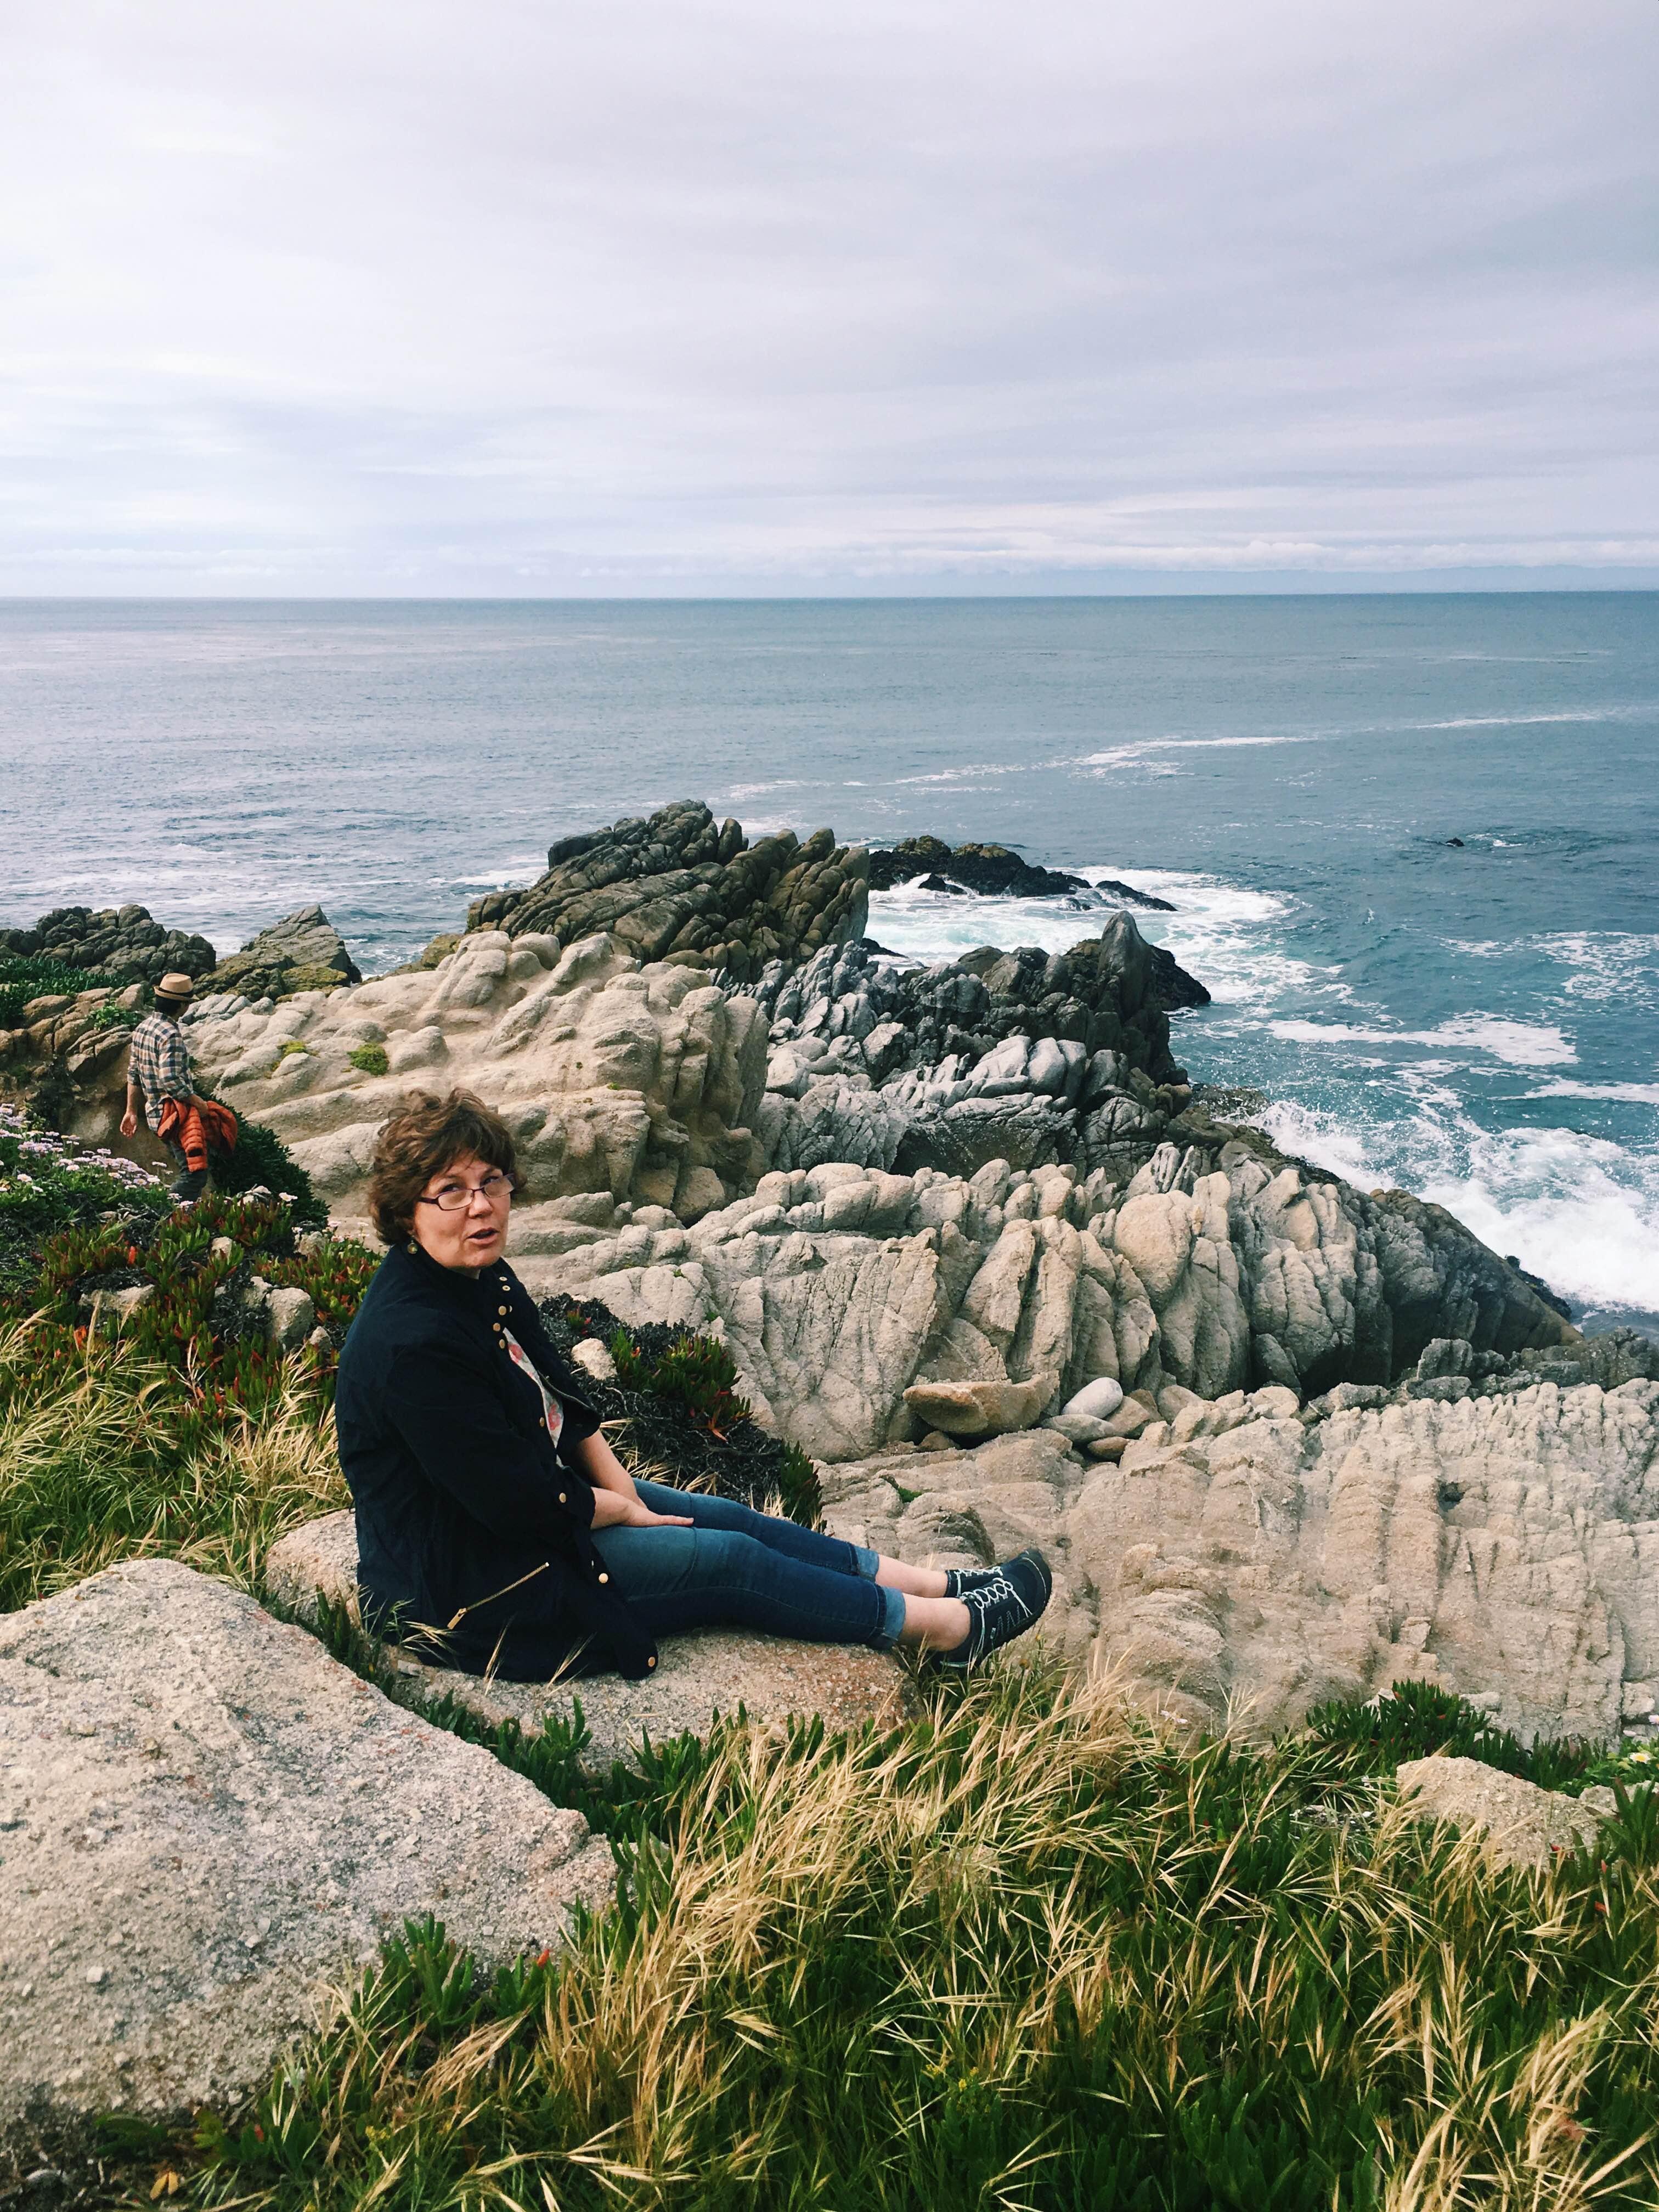 #GrabYourMoment Monterey - 6